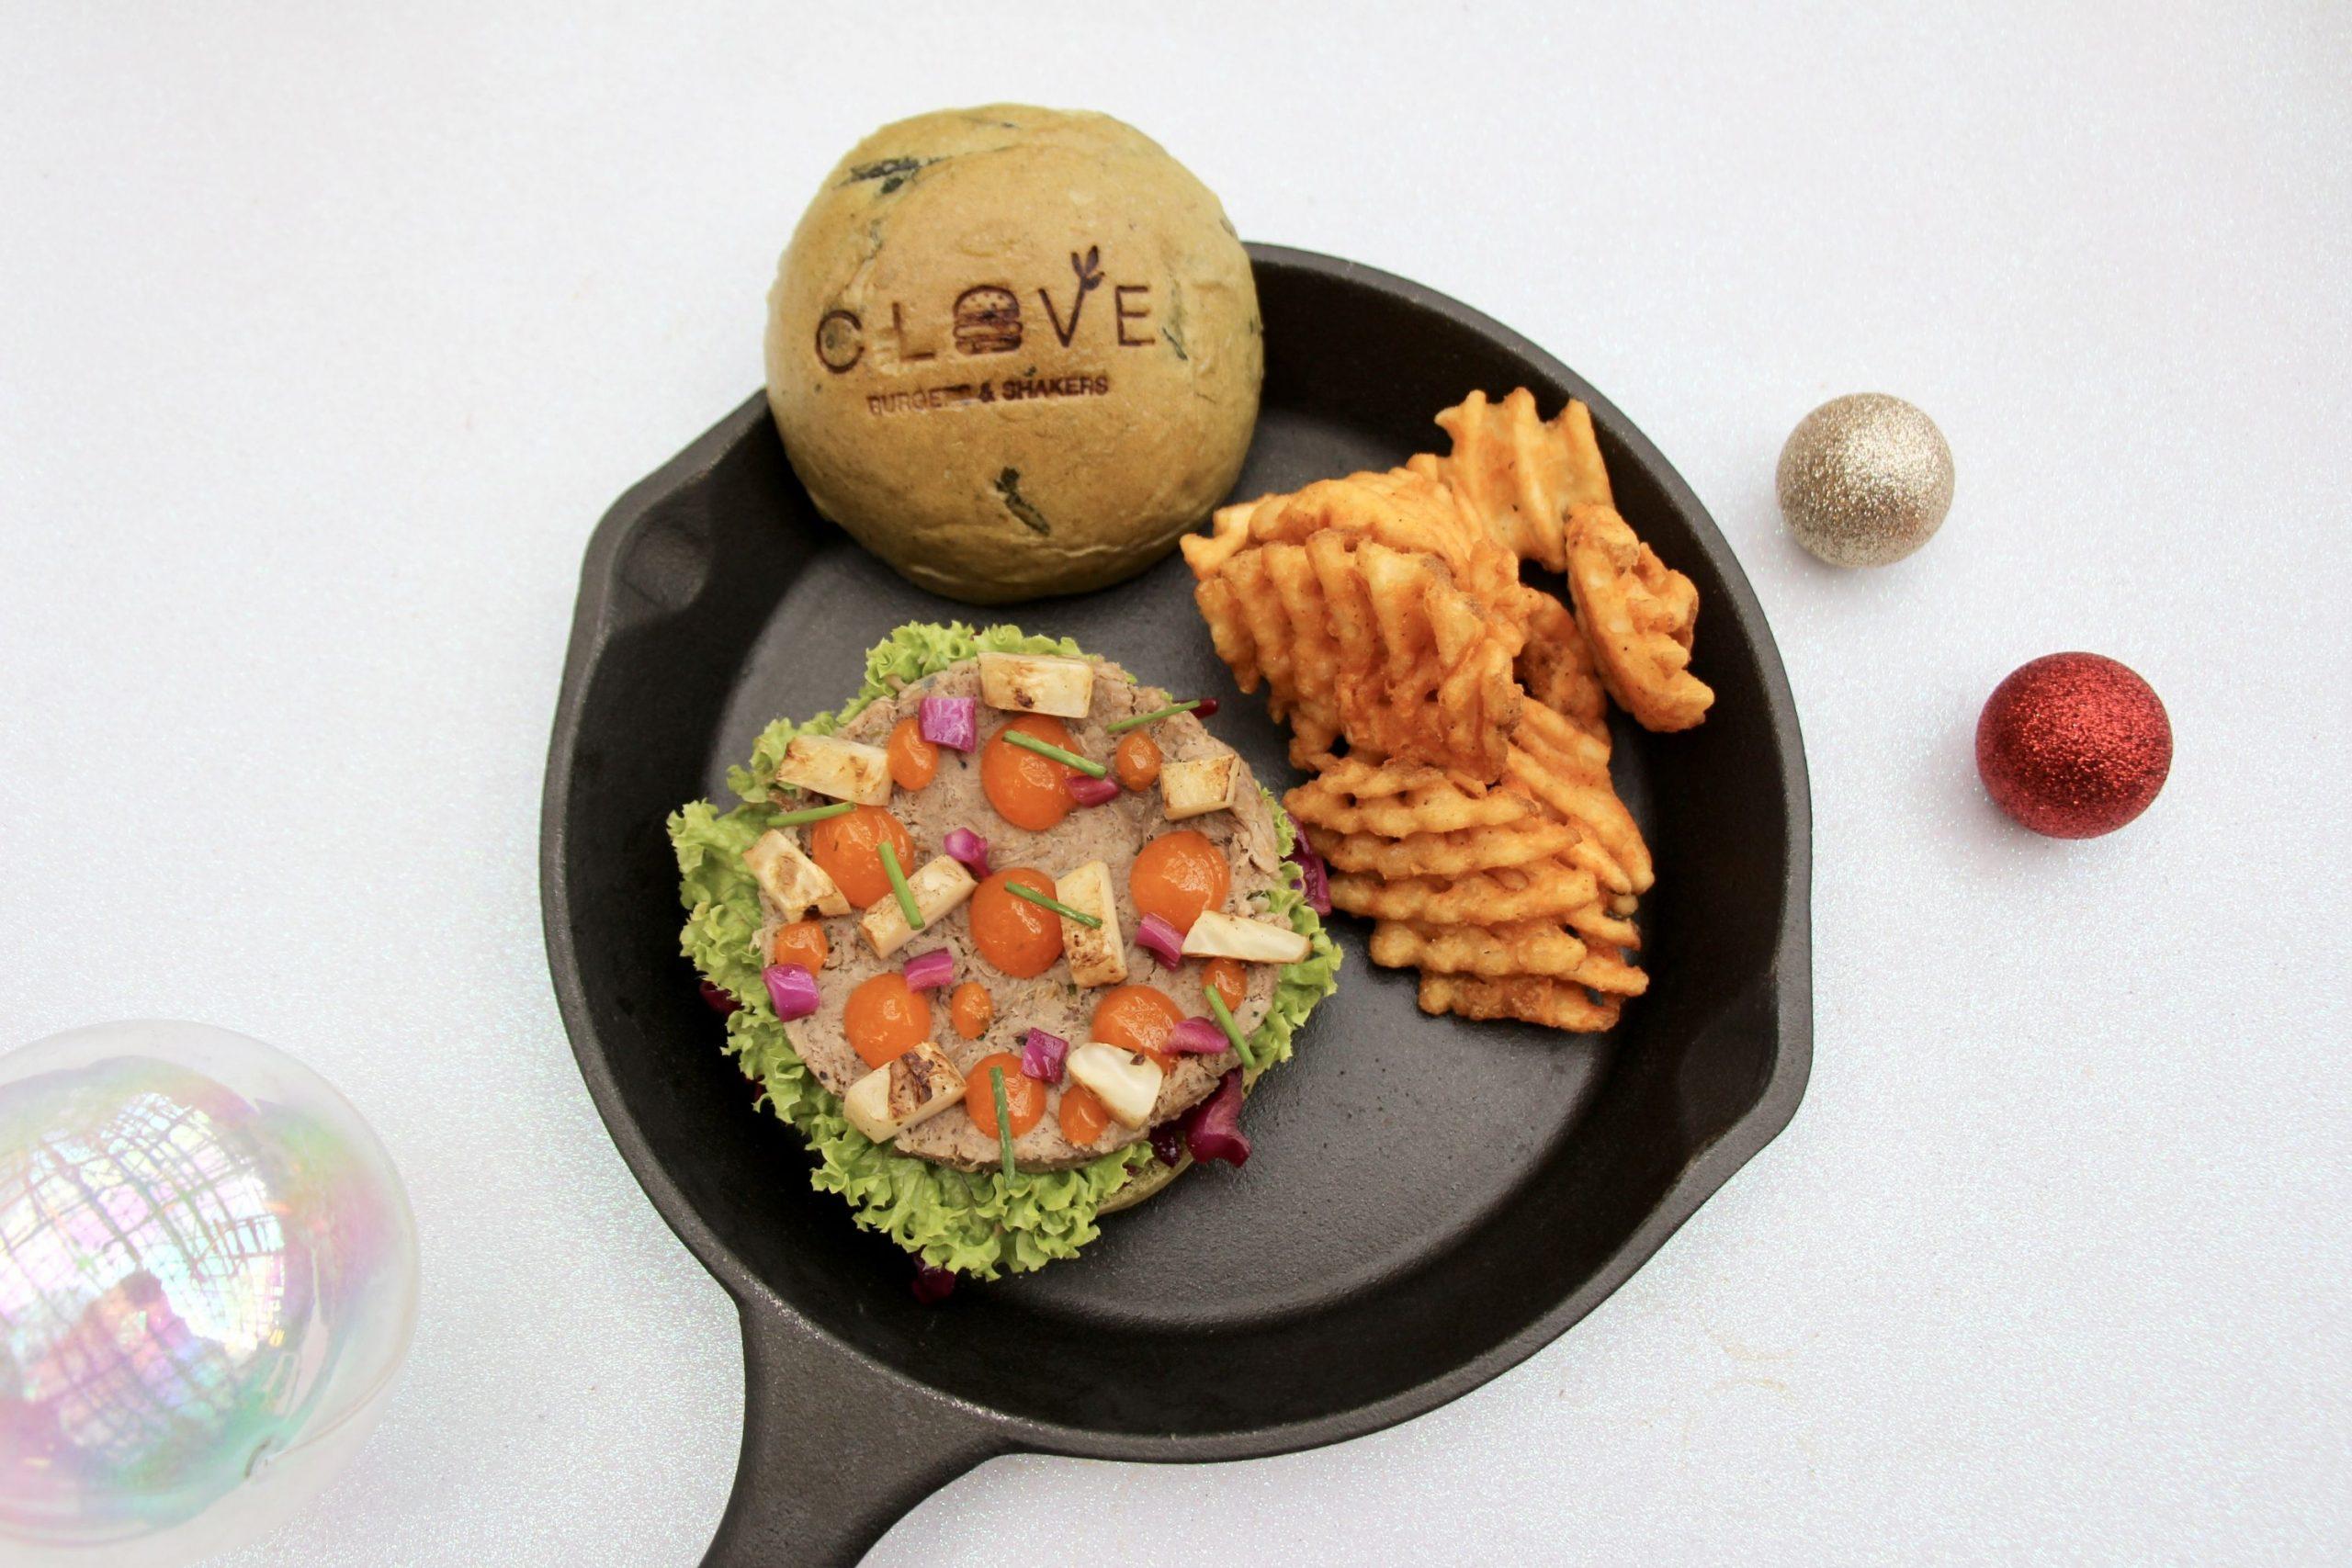 CLOVE Festive Burger